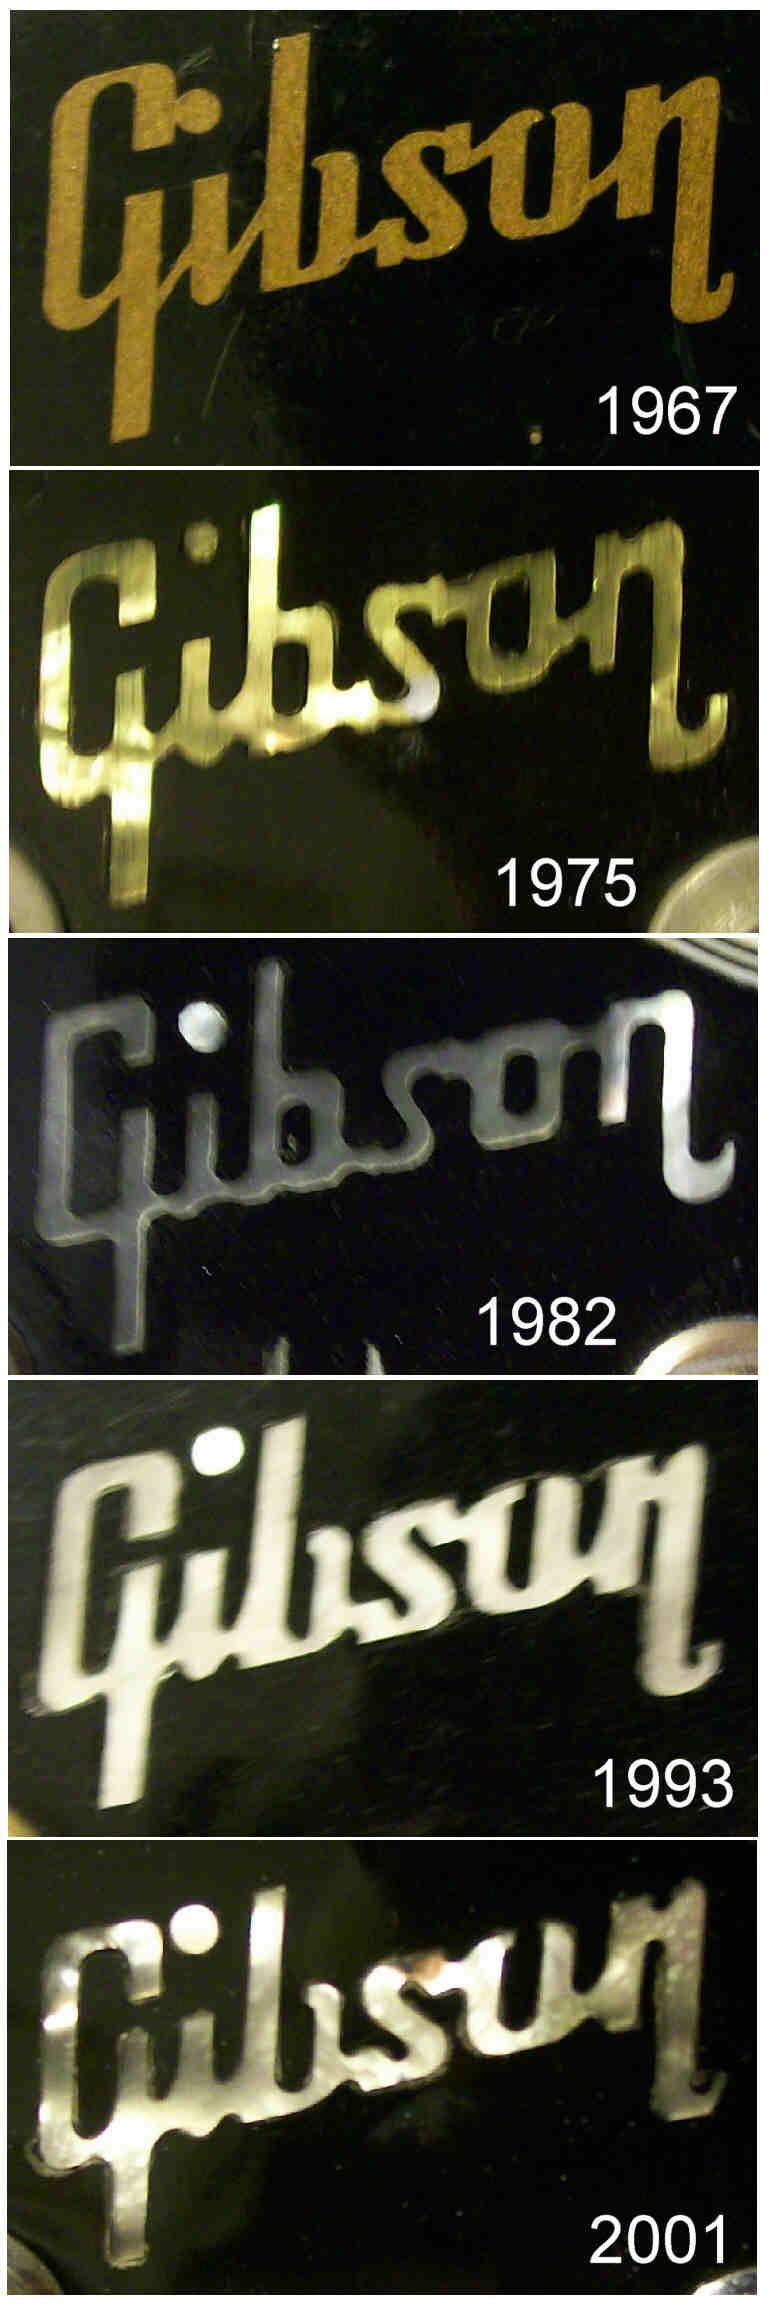 Gibson headstock logo inlays through the years.